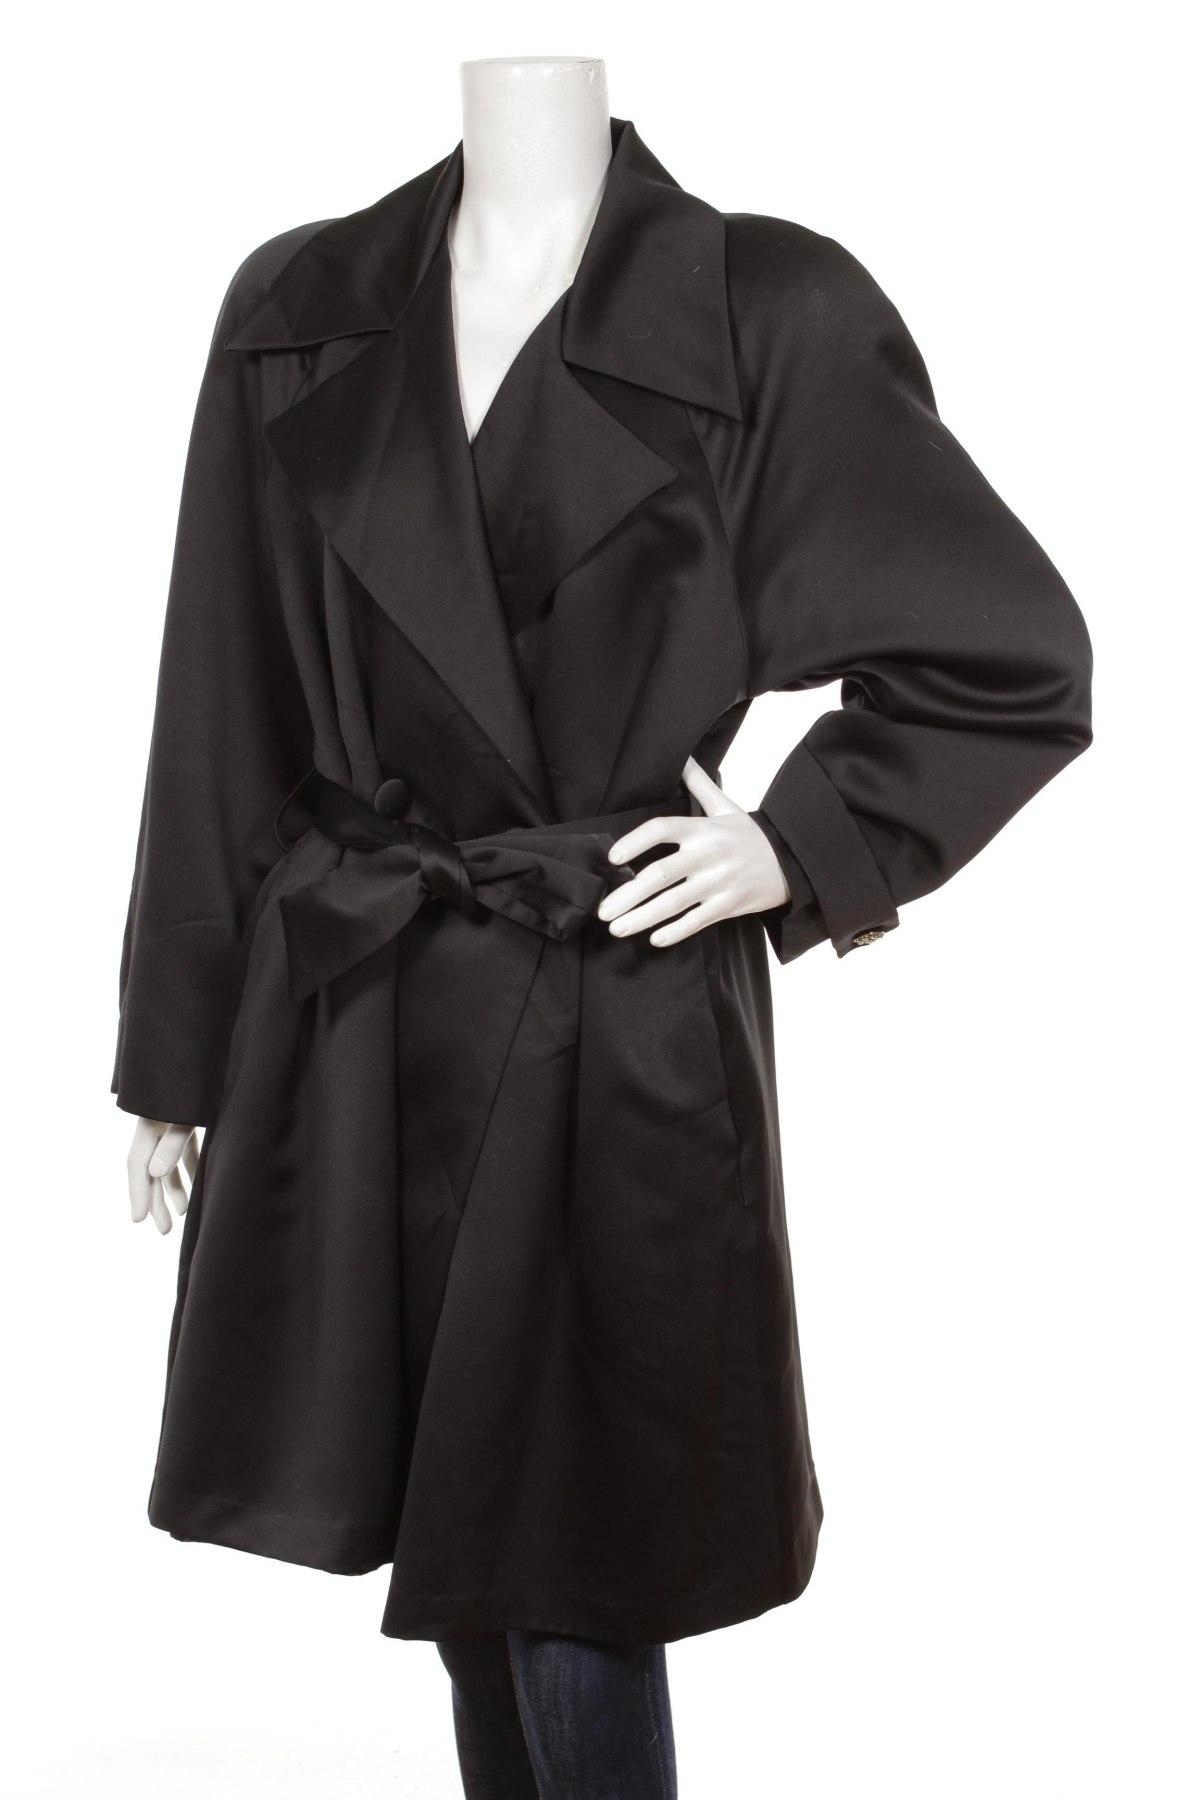 65544b00a325 Γυναικείο παλτό Patra - σε συμφέρουσα τιμή στο Remix -  103037924